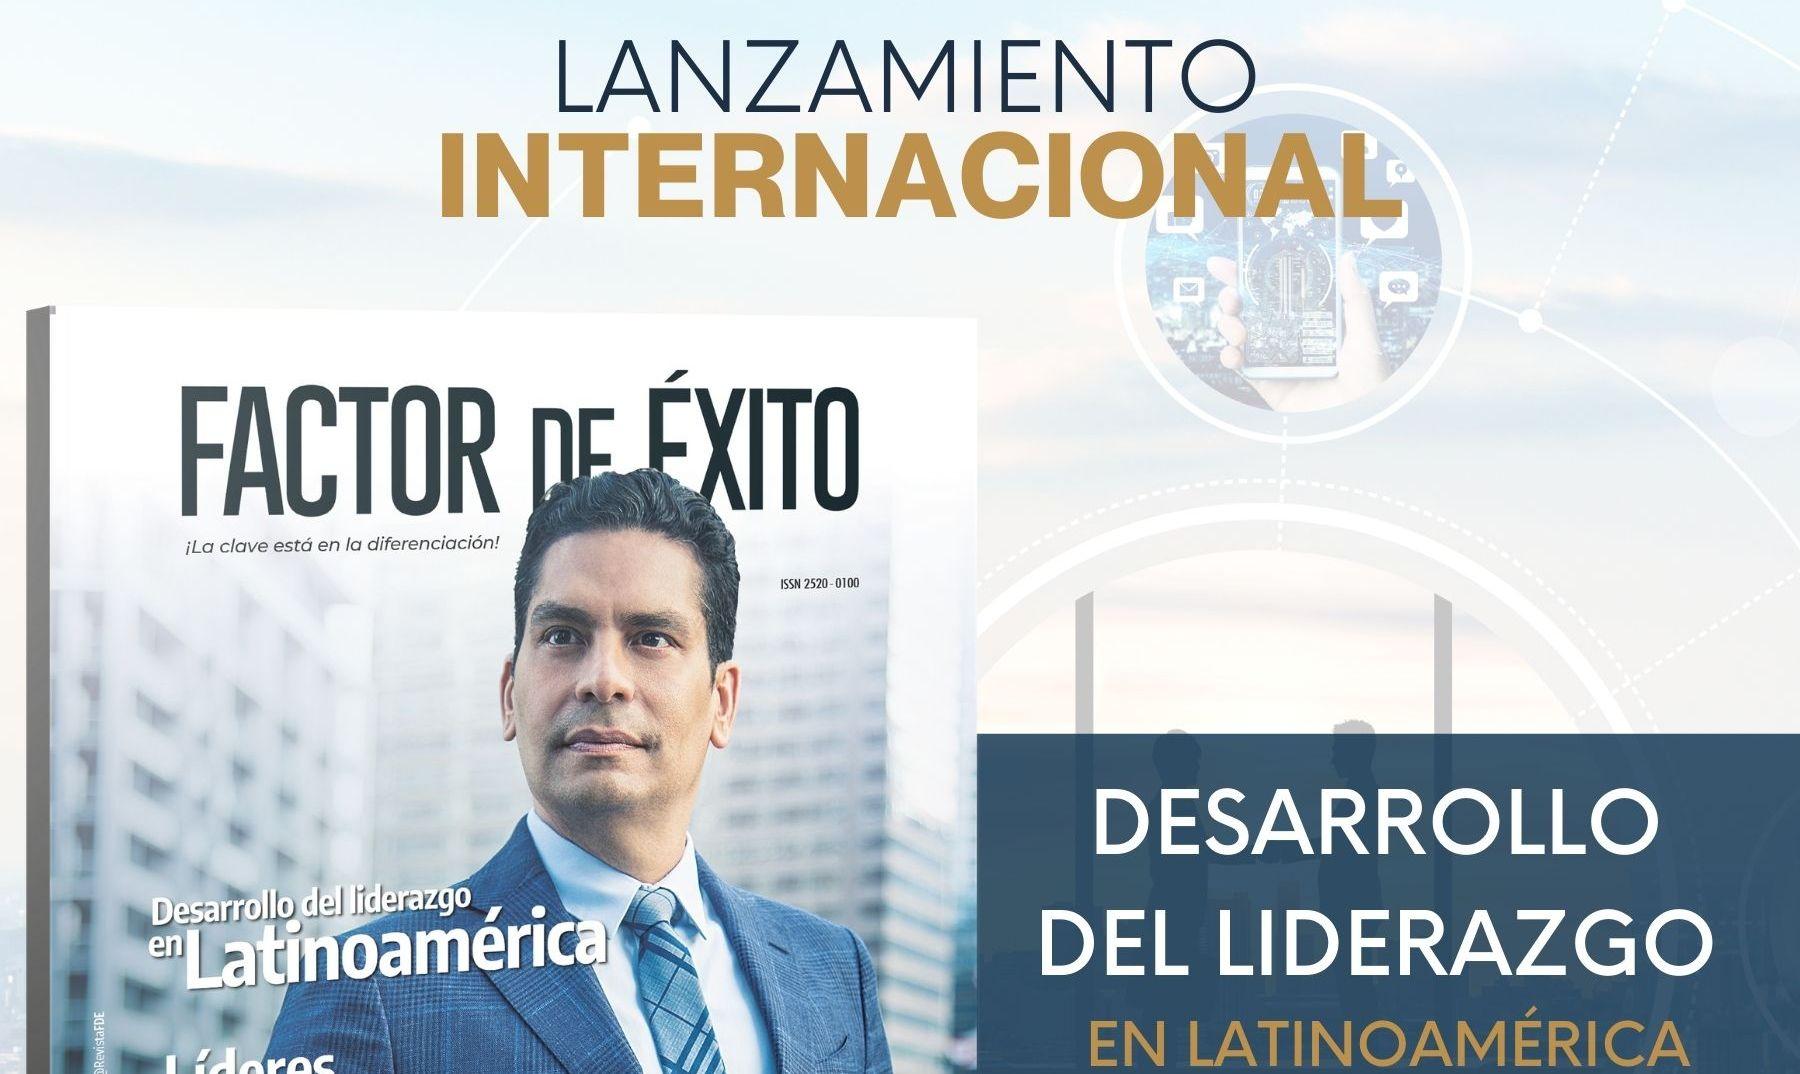 REVISTA FACTOR DE ÉXITO SUMA CINCO PAÍSES EN LATINOAMÉRICA Y DOS CIUDADES DE USA, EN SU EXPANSIÓN INTERNACIONAL